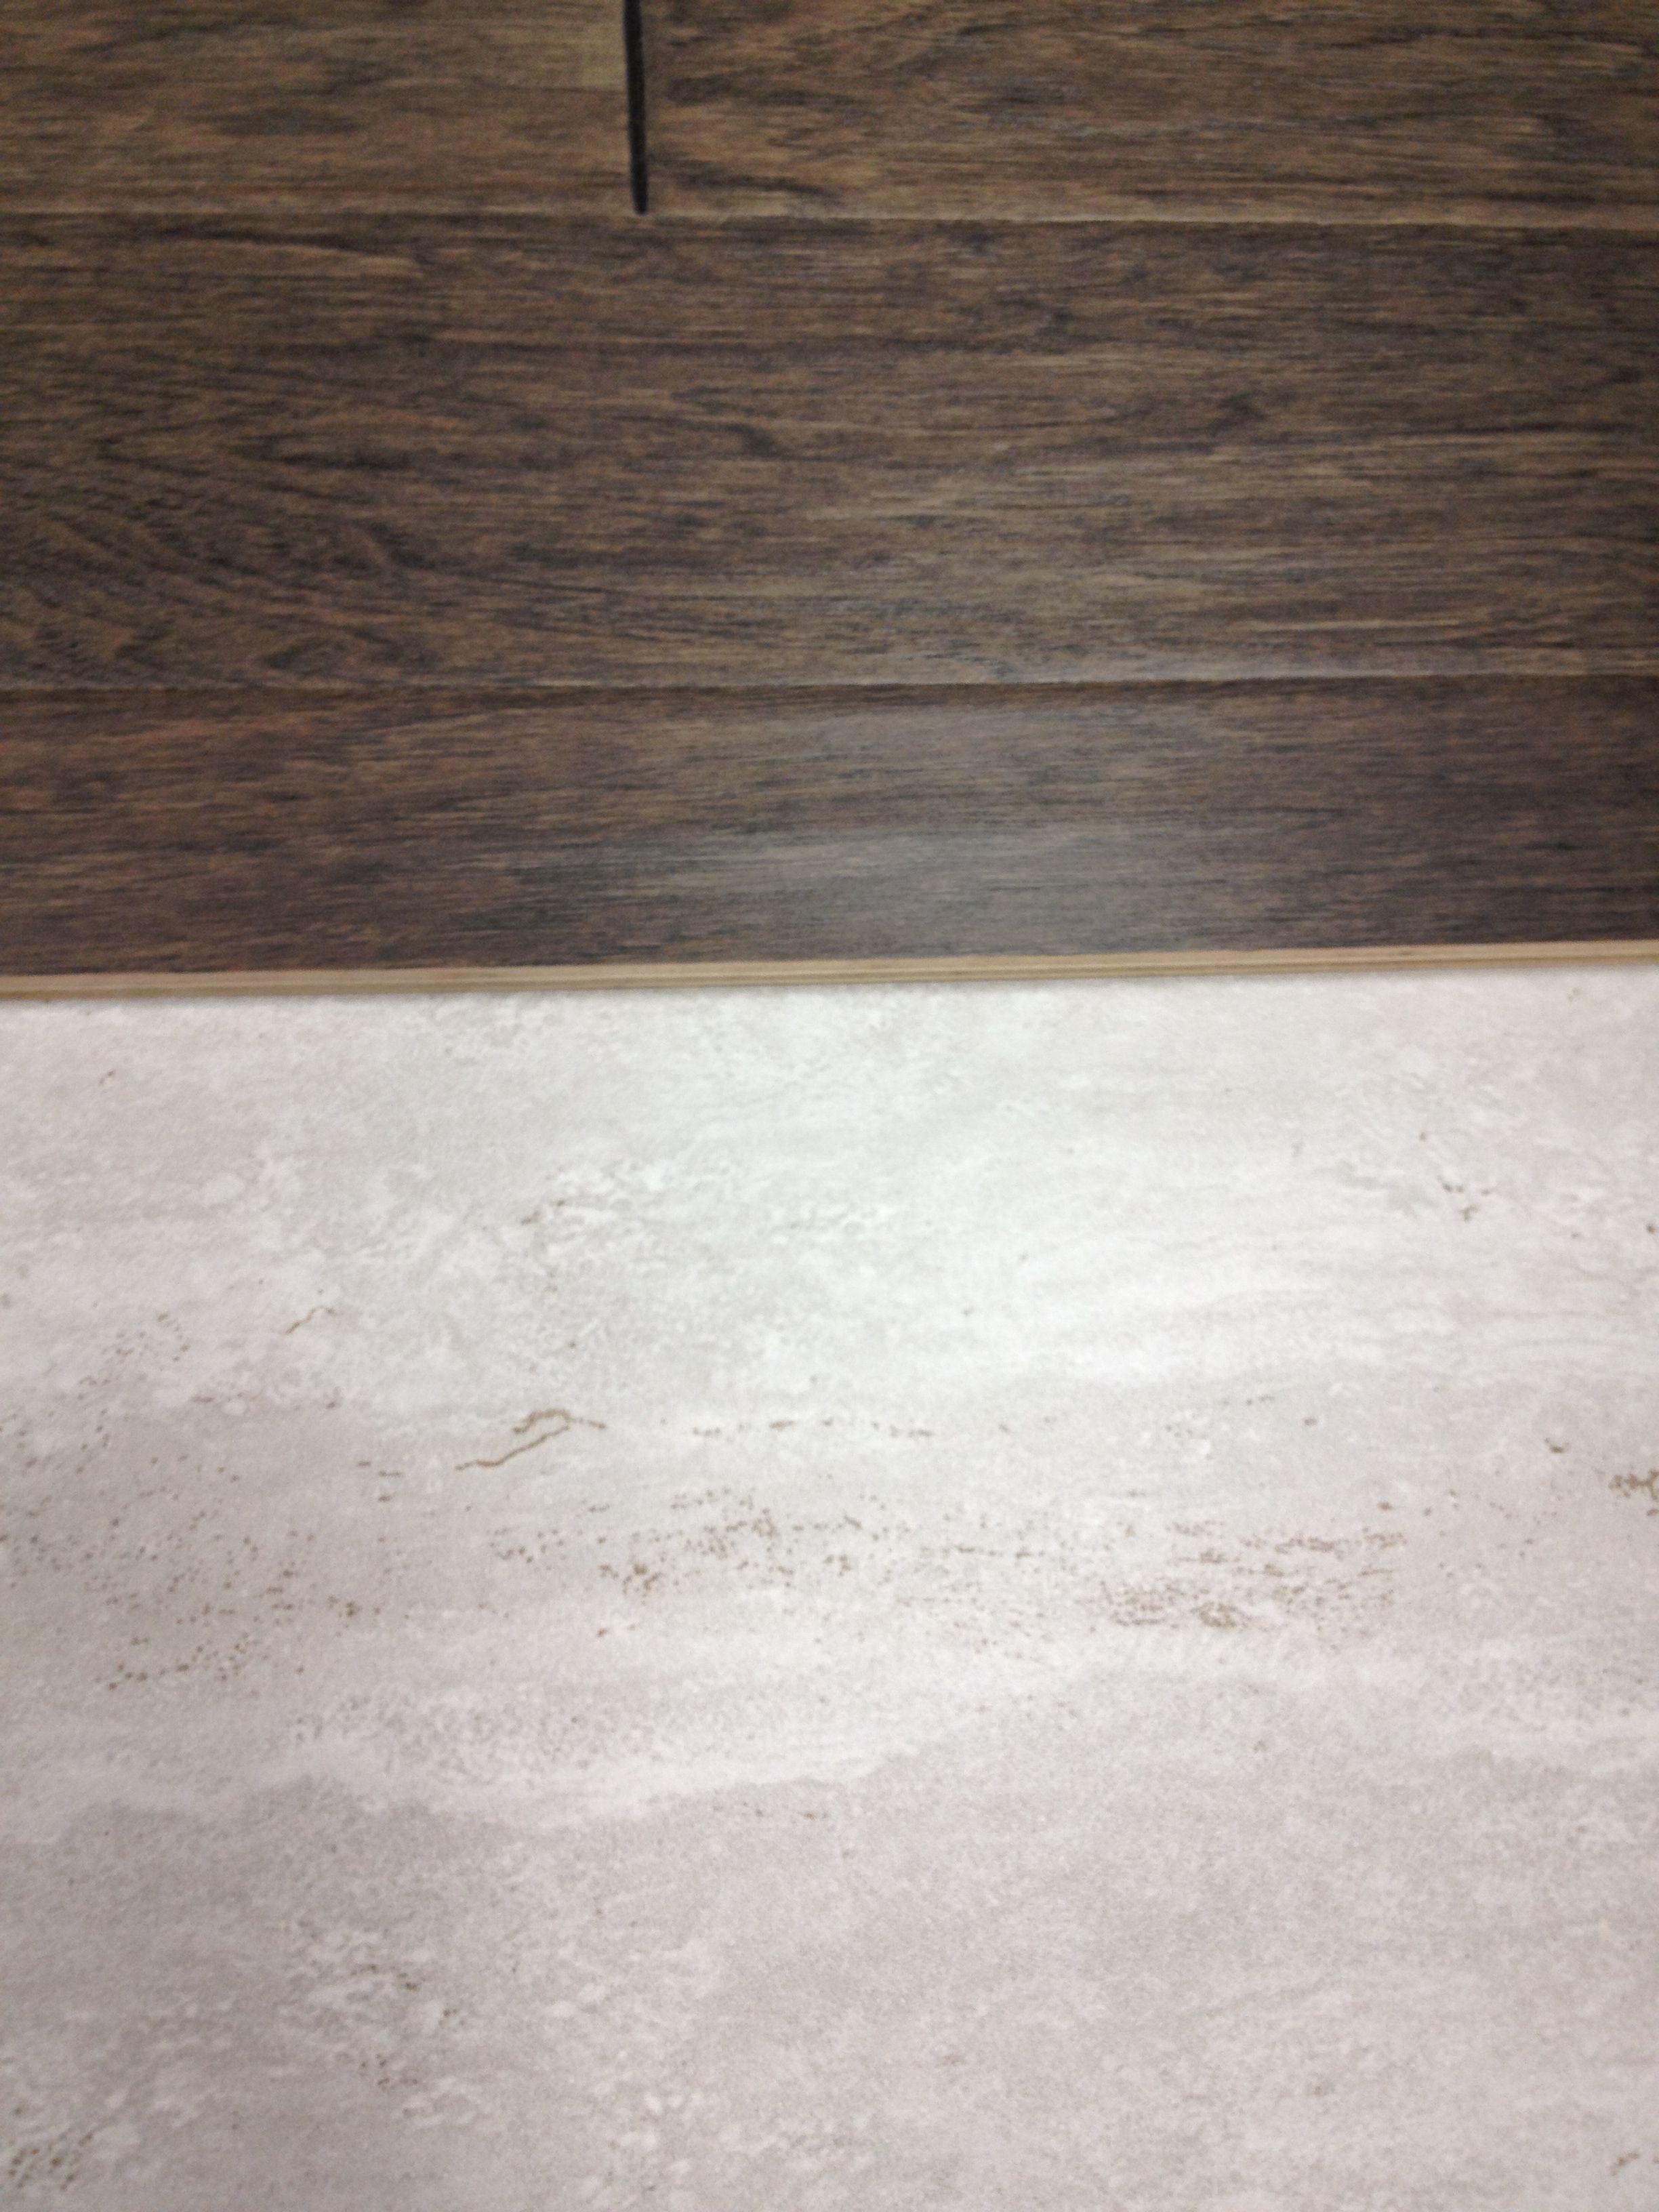 Grey Hardwood Floors Next To Light Grey Tile Small Remodel